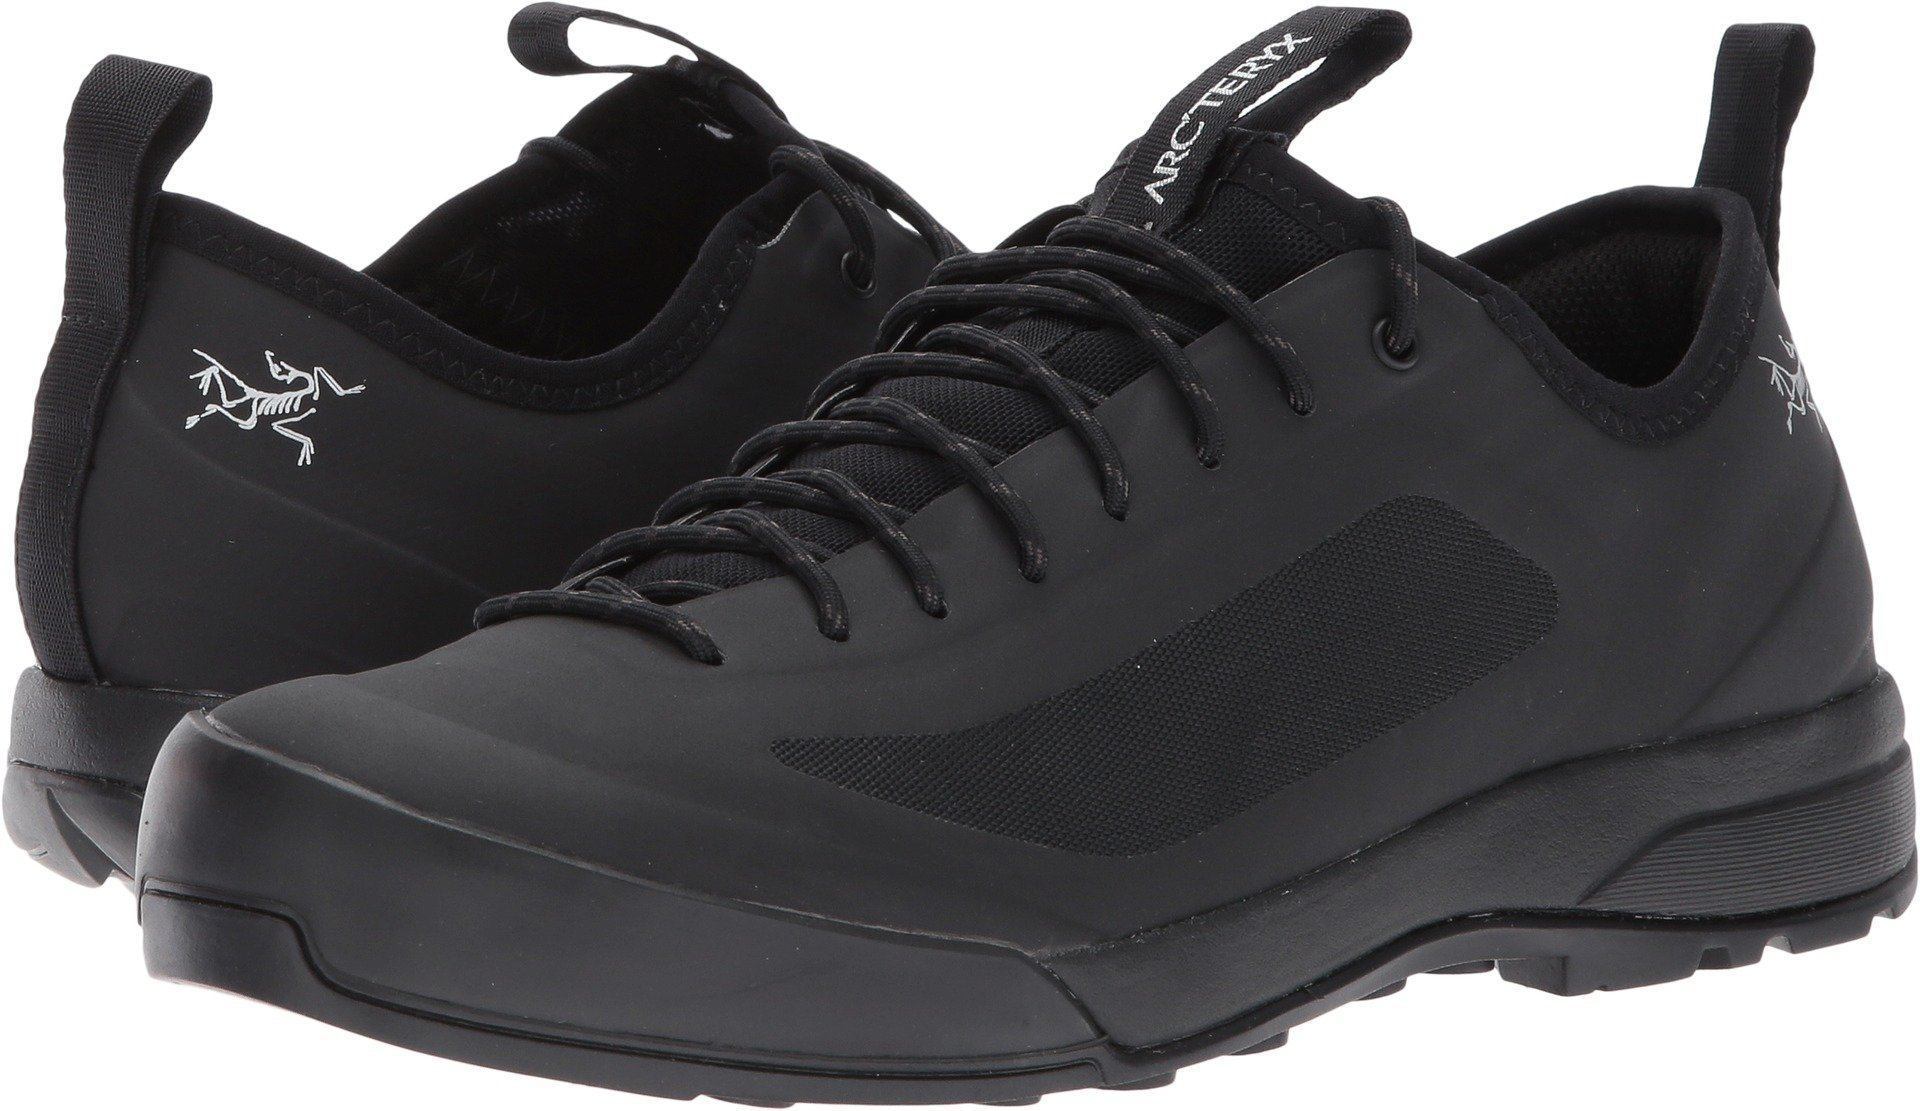 Arc'teryx Acrux SL Approach Shoes - Women's Black/Black 6.5